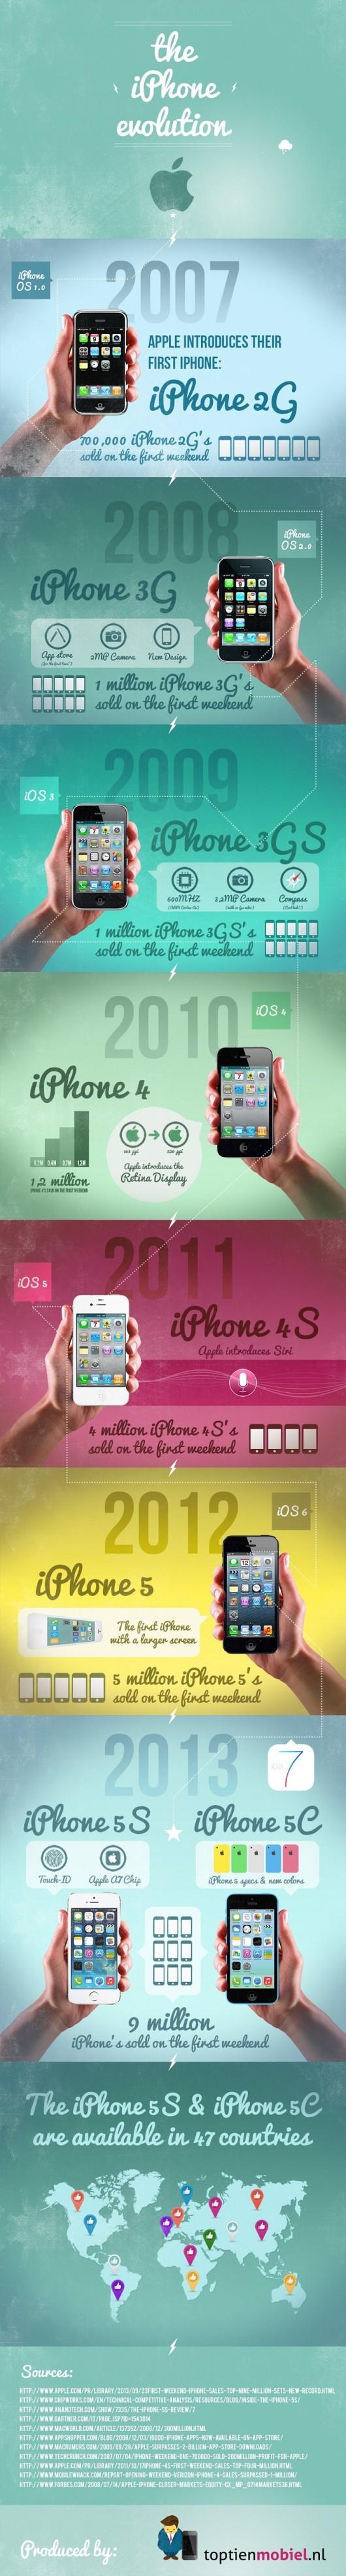 iPhone-Evolution-Infographic